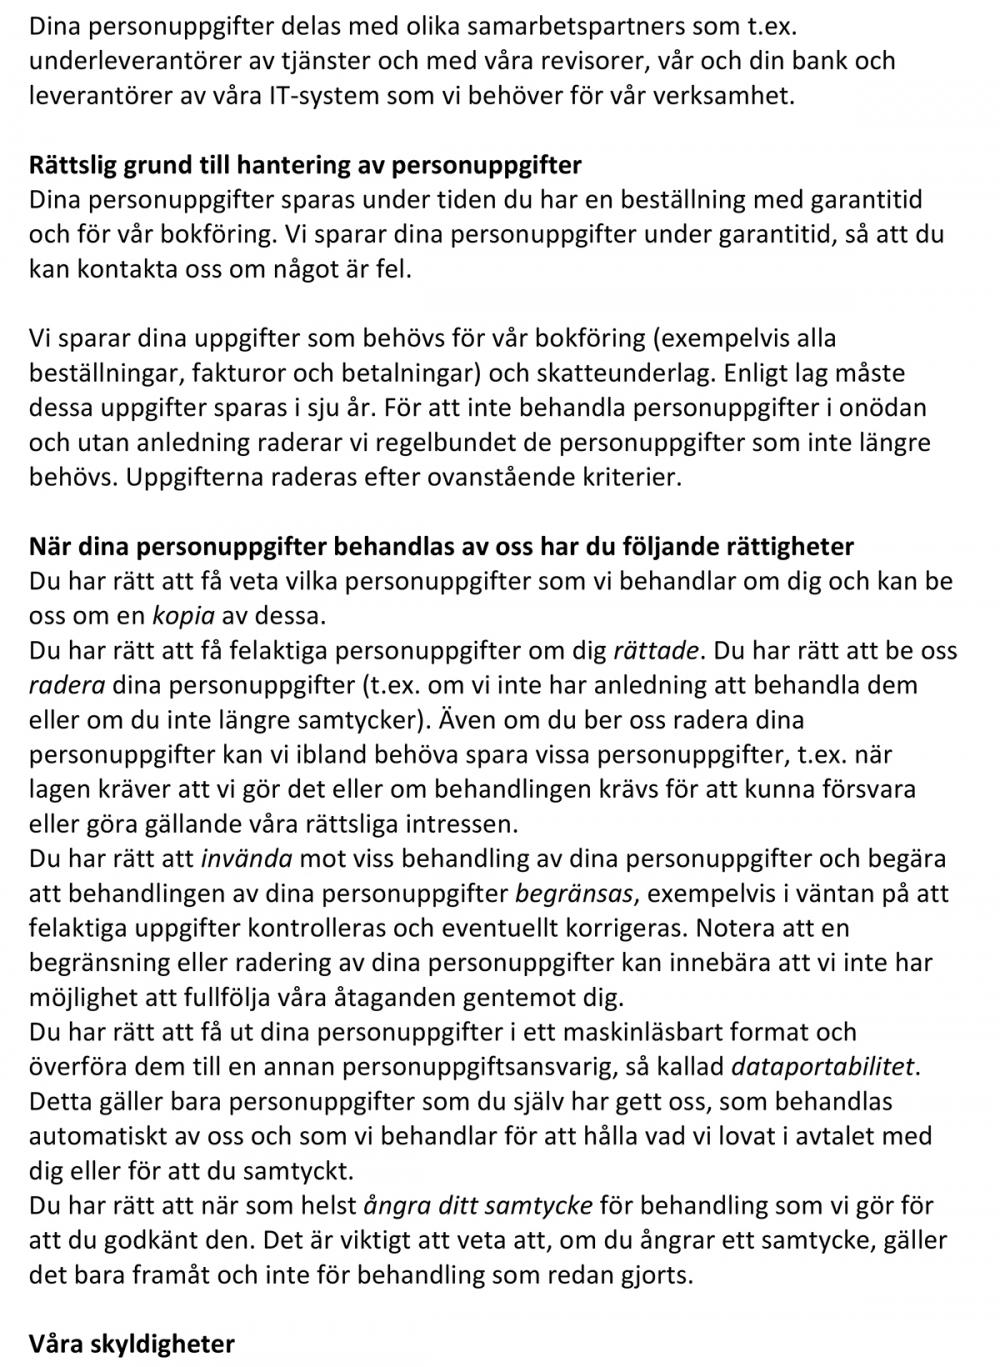 Microsoft Word - personuppgiftpolicy gdpr - göran lindström måleri.docx